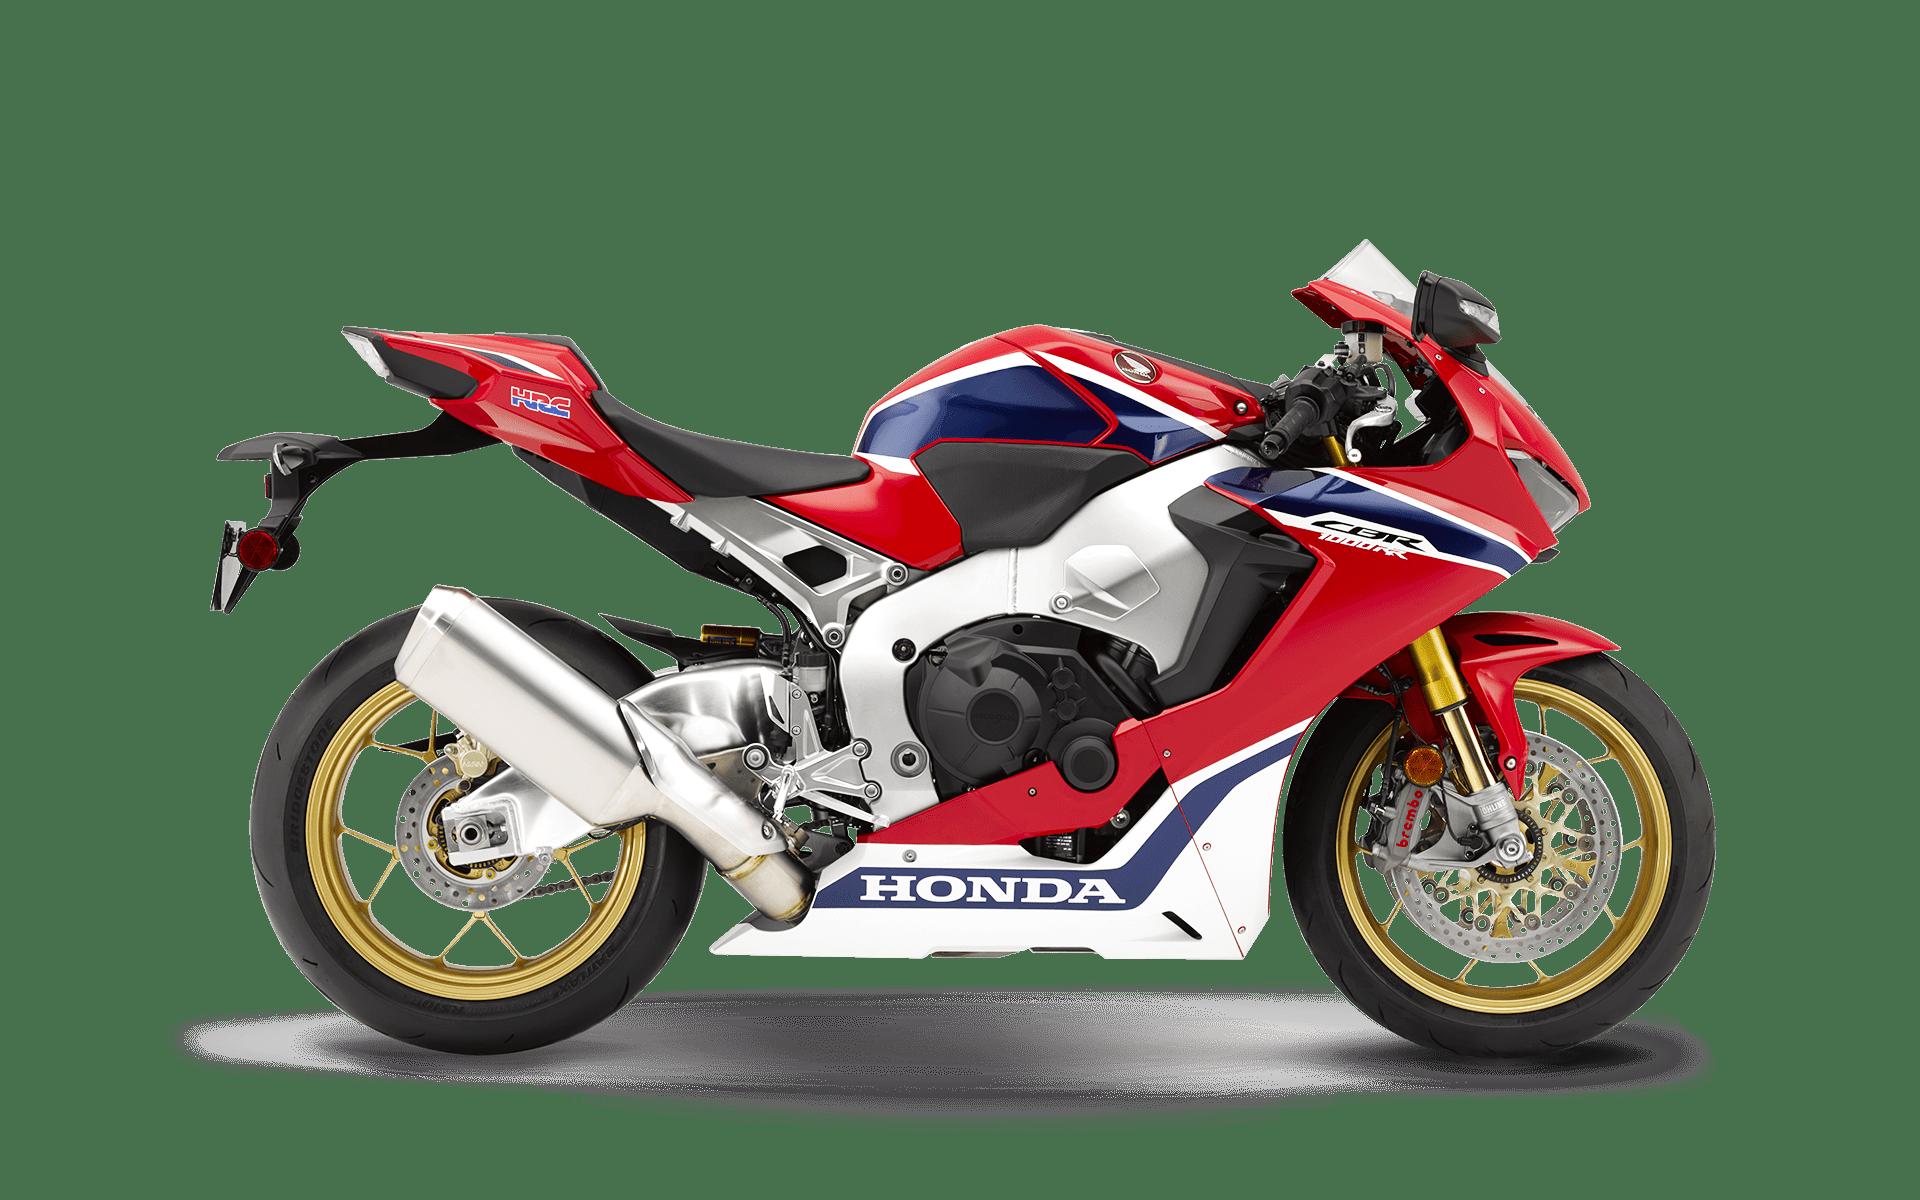 Honda Motorcycle - Iain Mutch